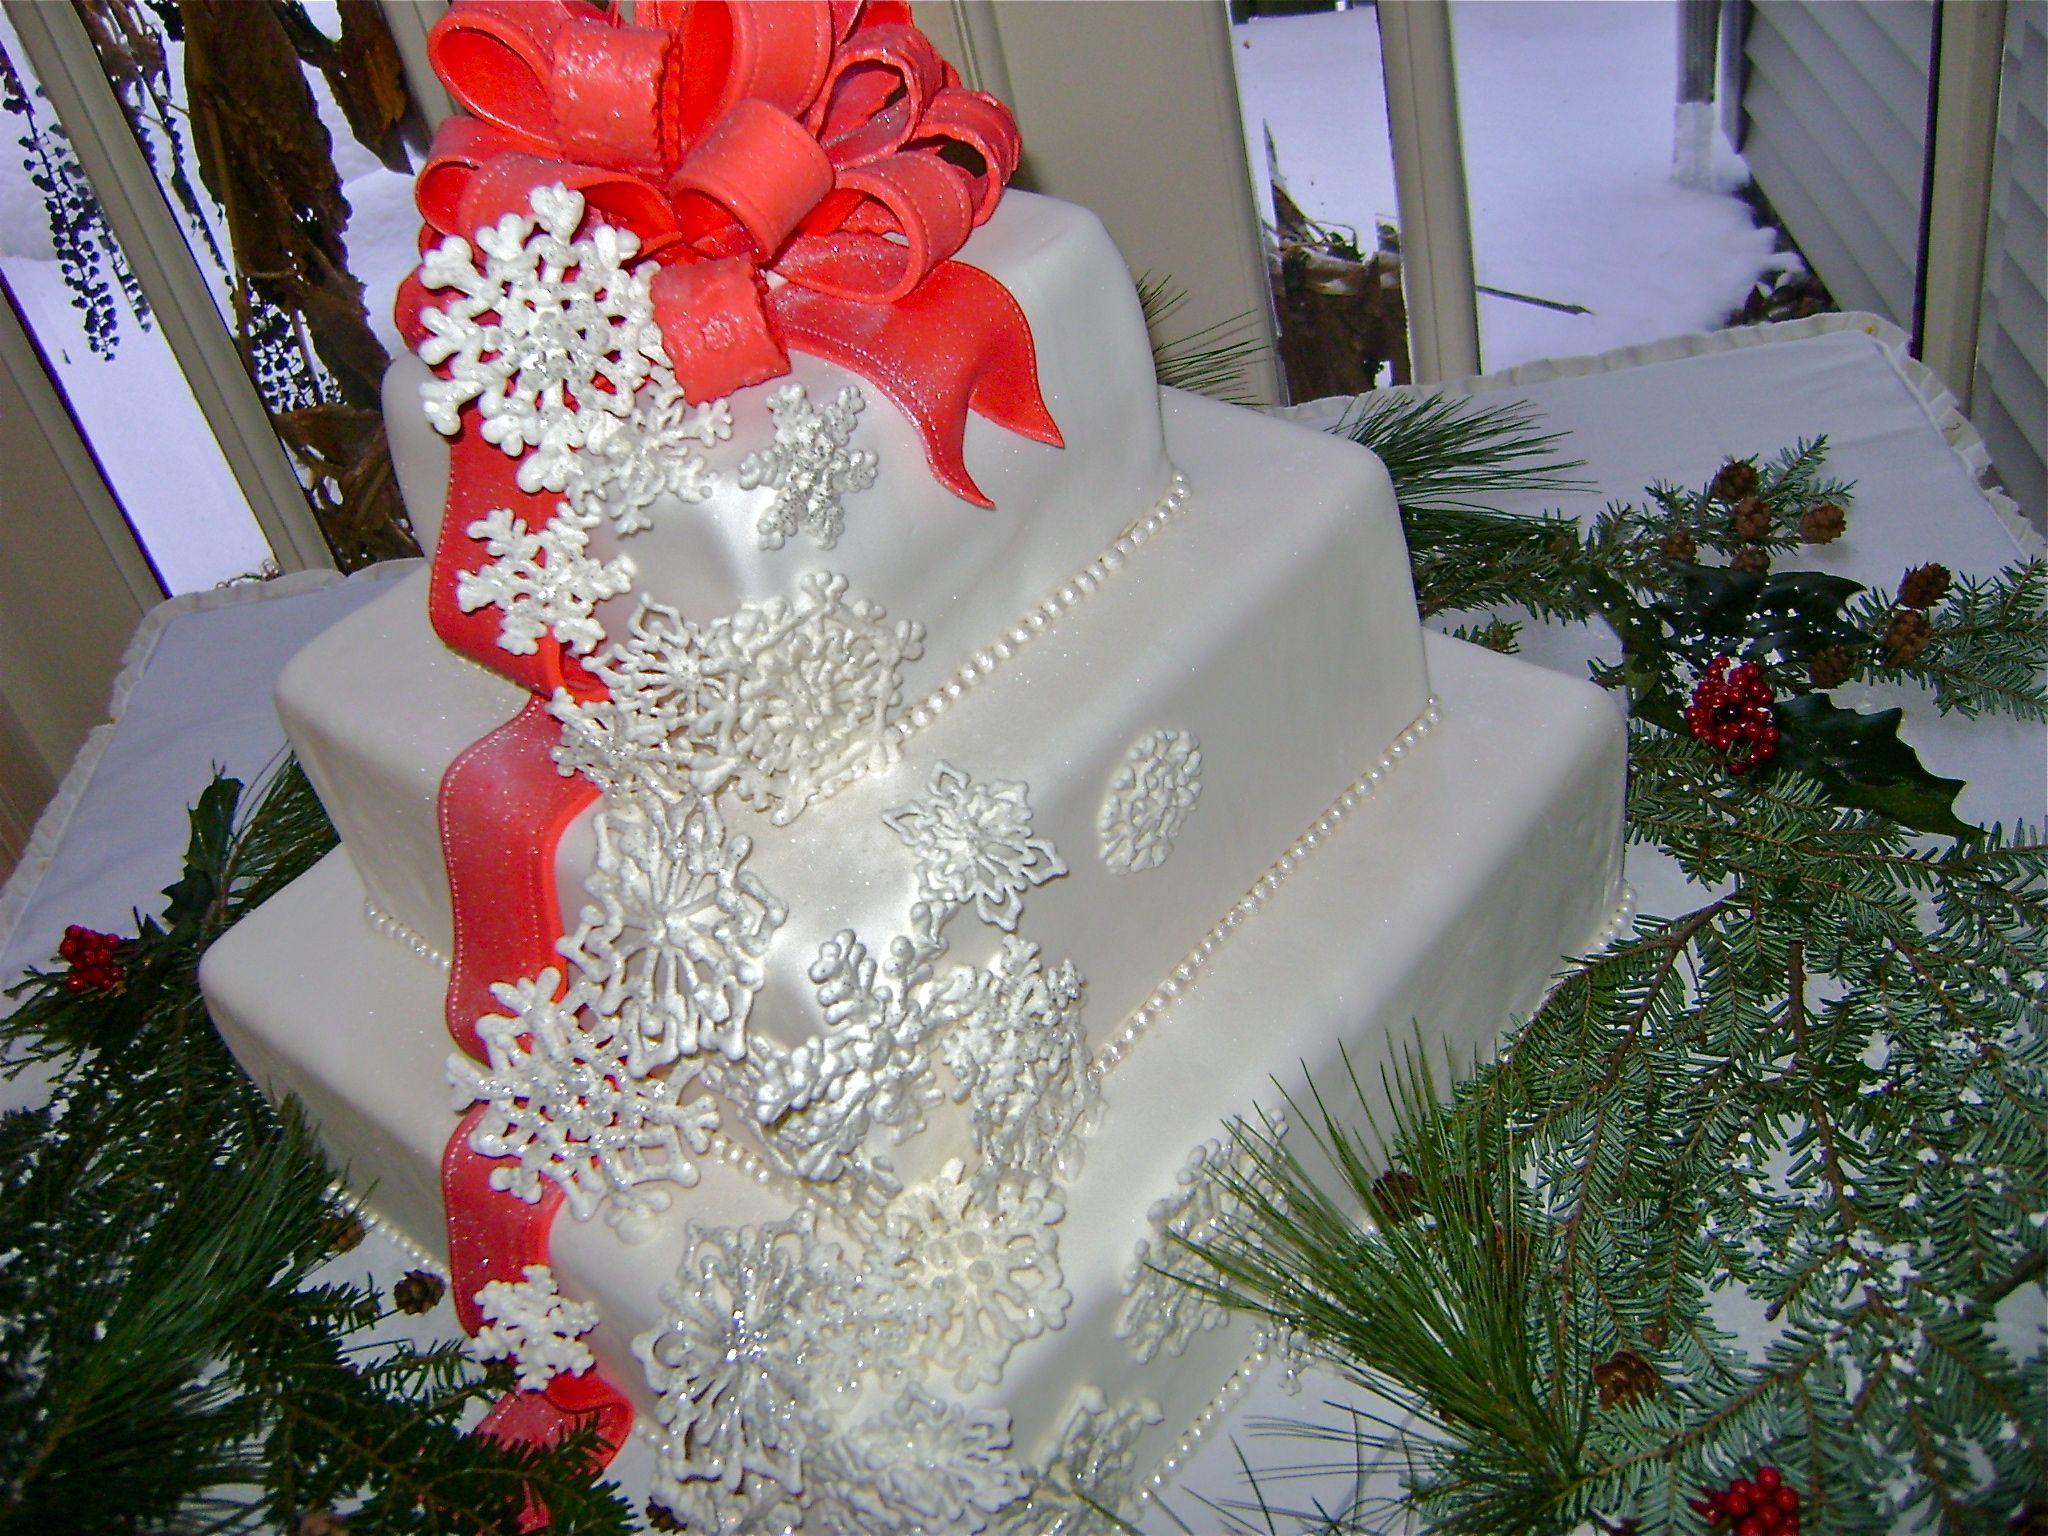 Square cake wedding cake red bow snowflake cake winter wedding